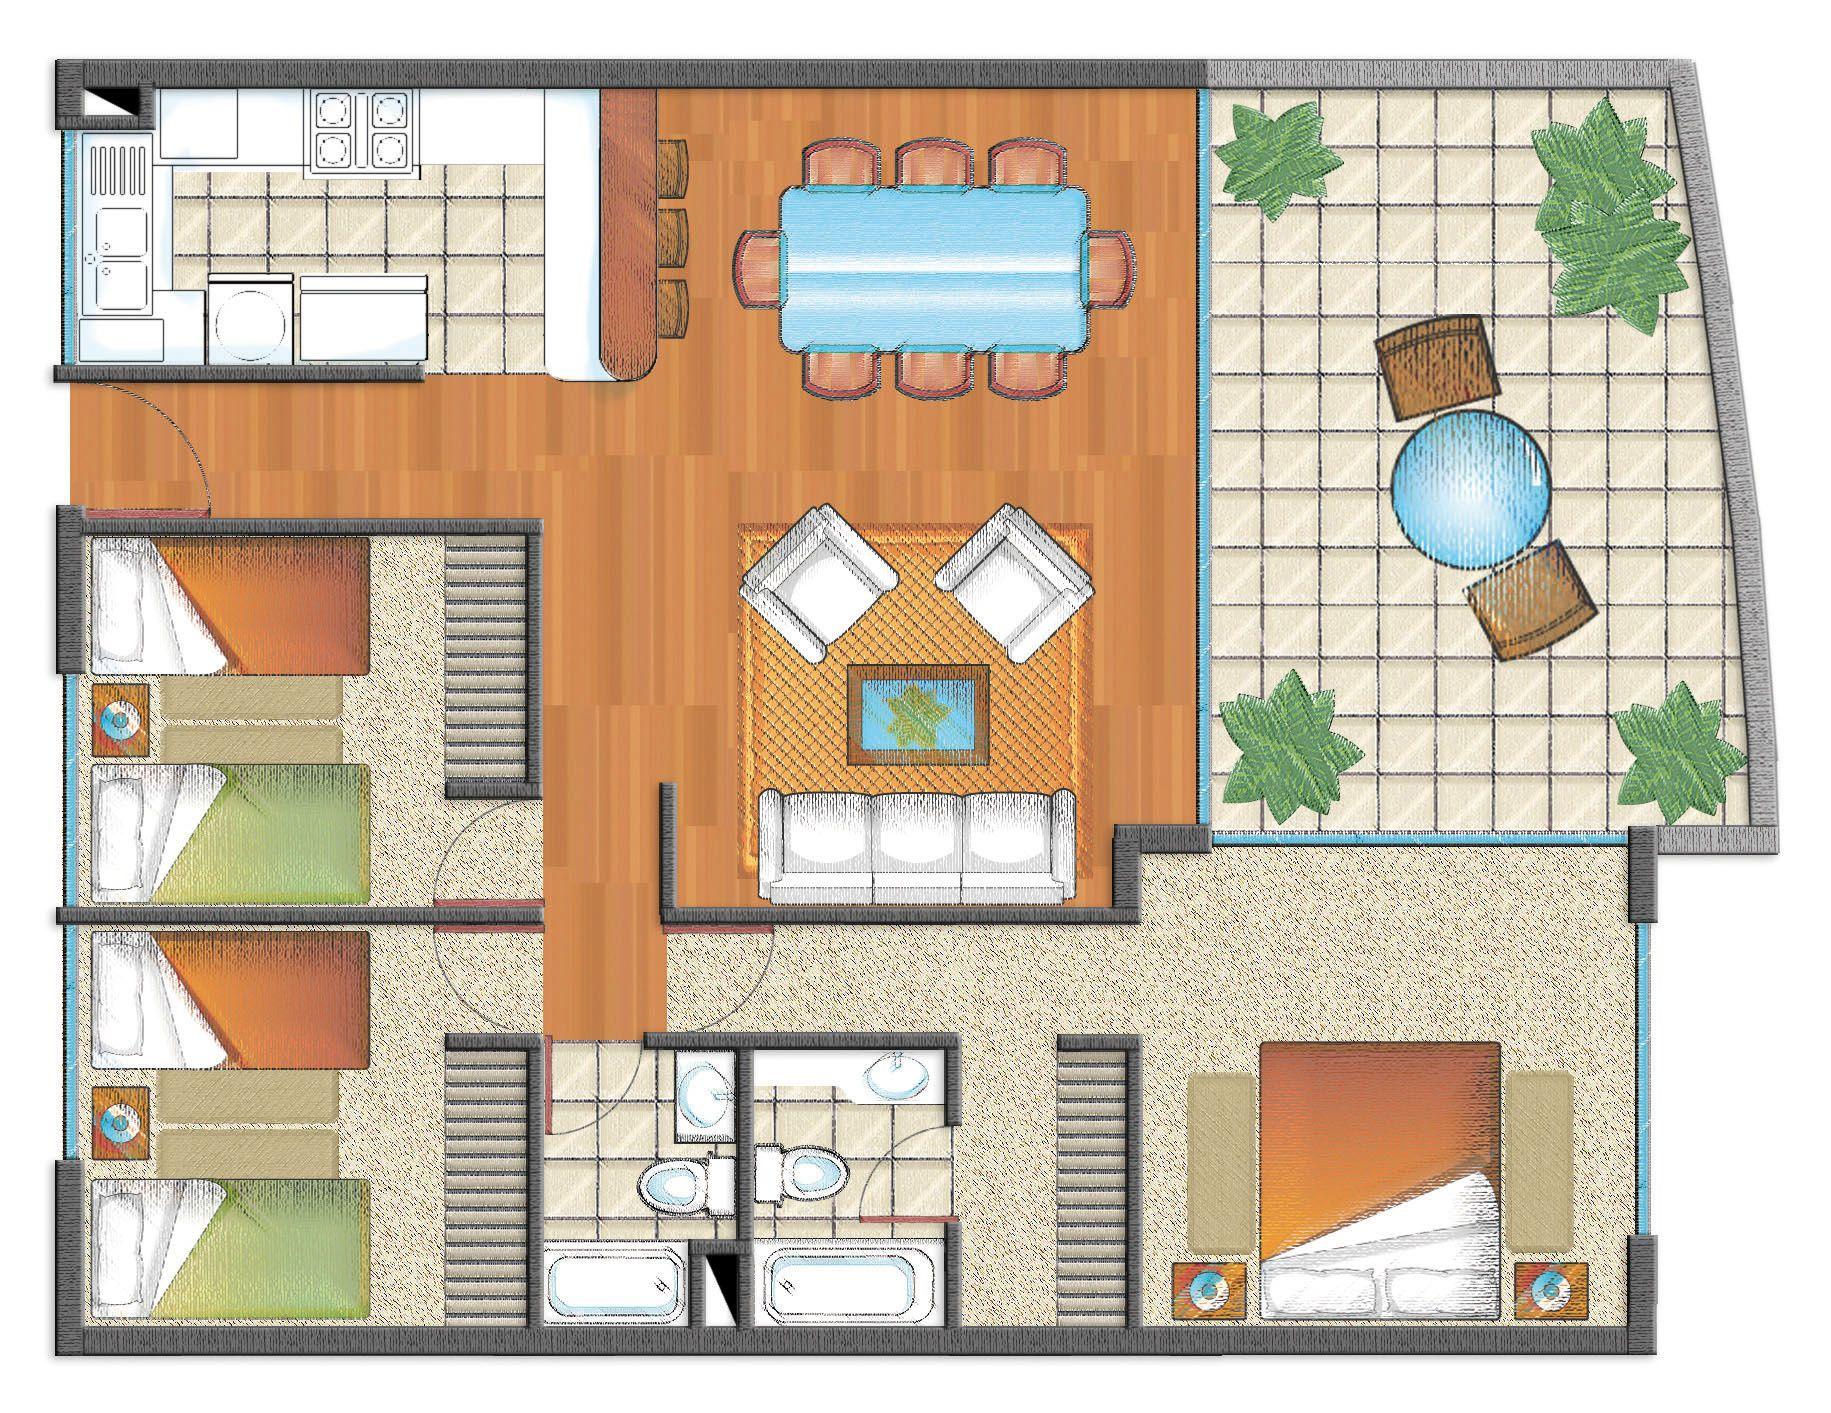 Plano De Casa De 1 Piso Con 3 Dormitorios 2 Banos Cocina Americana Y Piscina Buscar Con Google Planos De Casas Casas De 1 Piso Casas